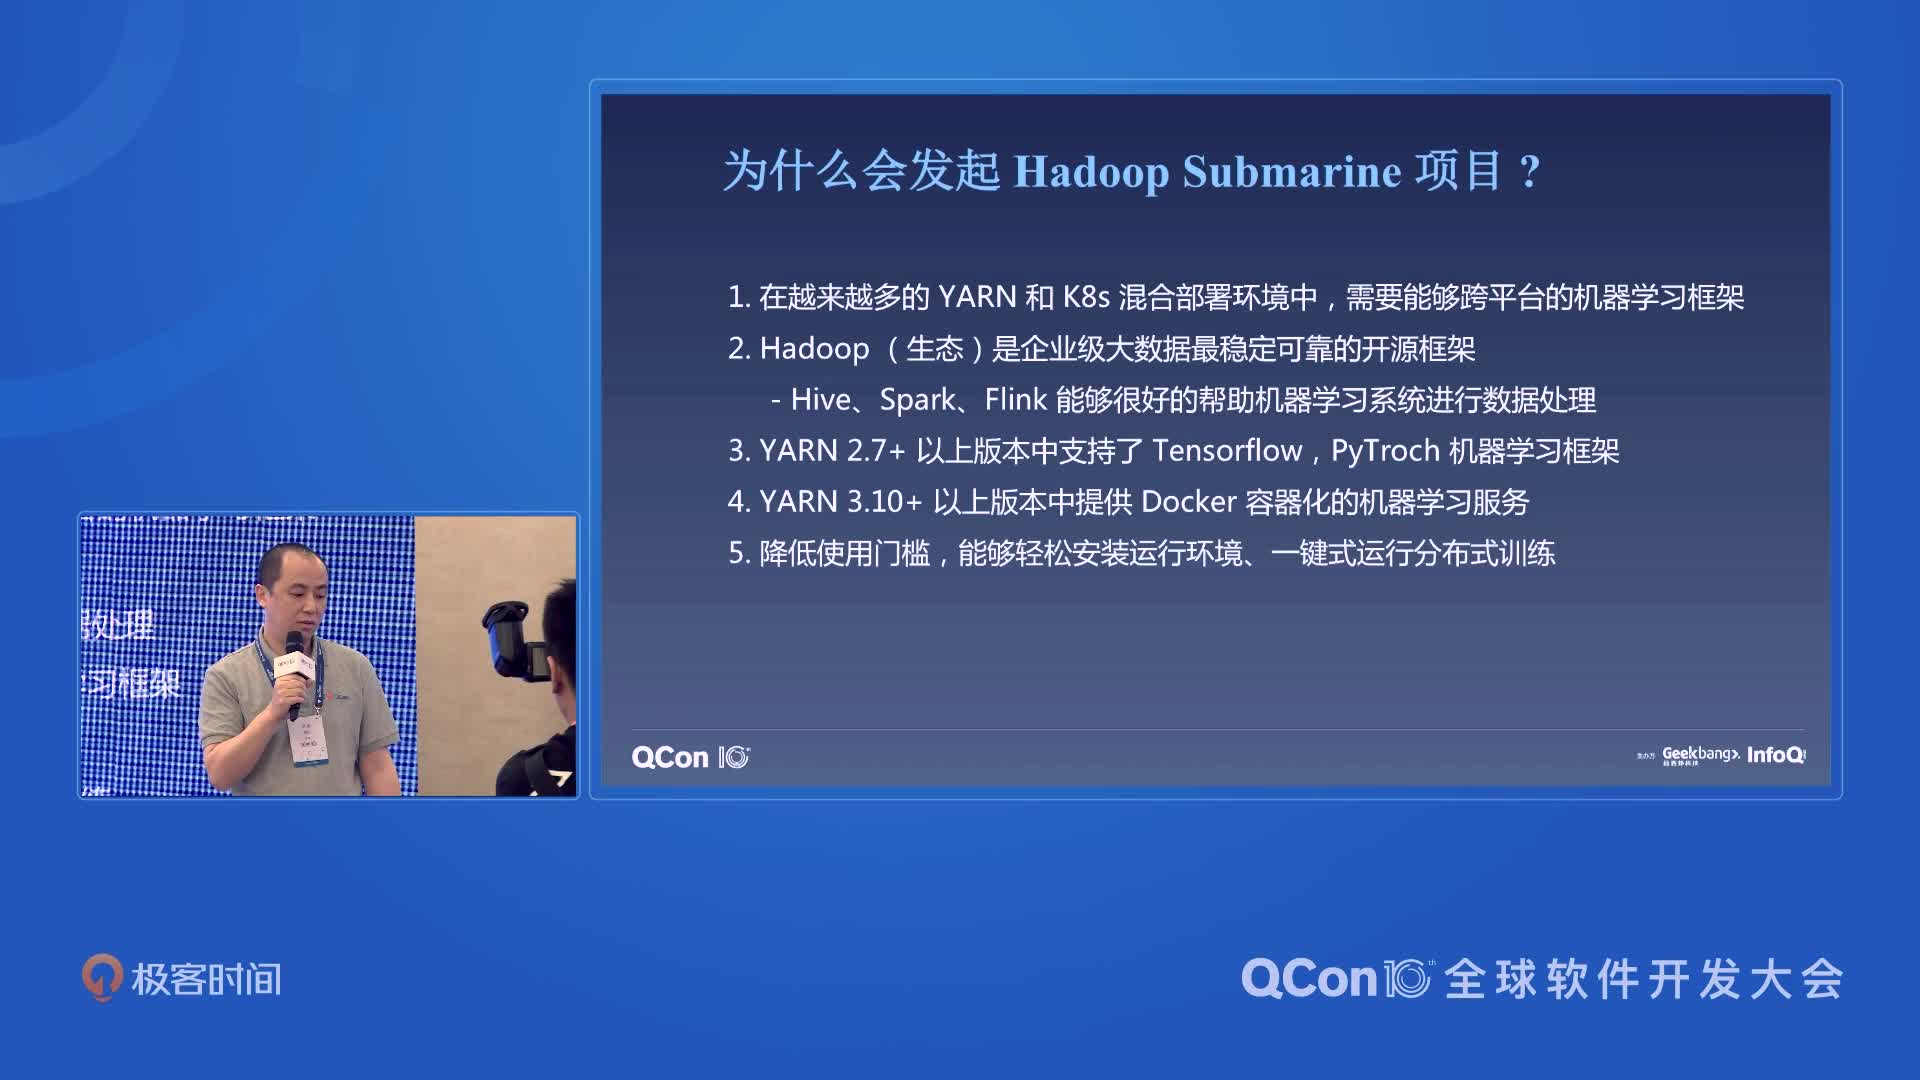 Apache Hadoop 机器学习引擎 Submarine 及生态